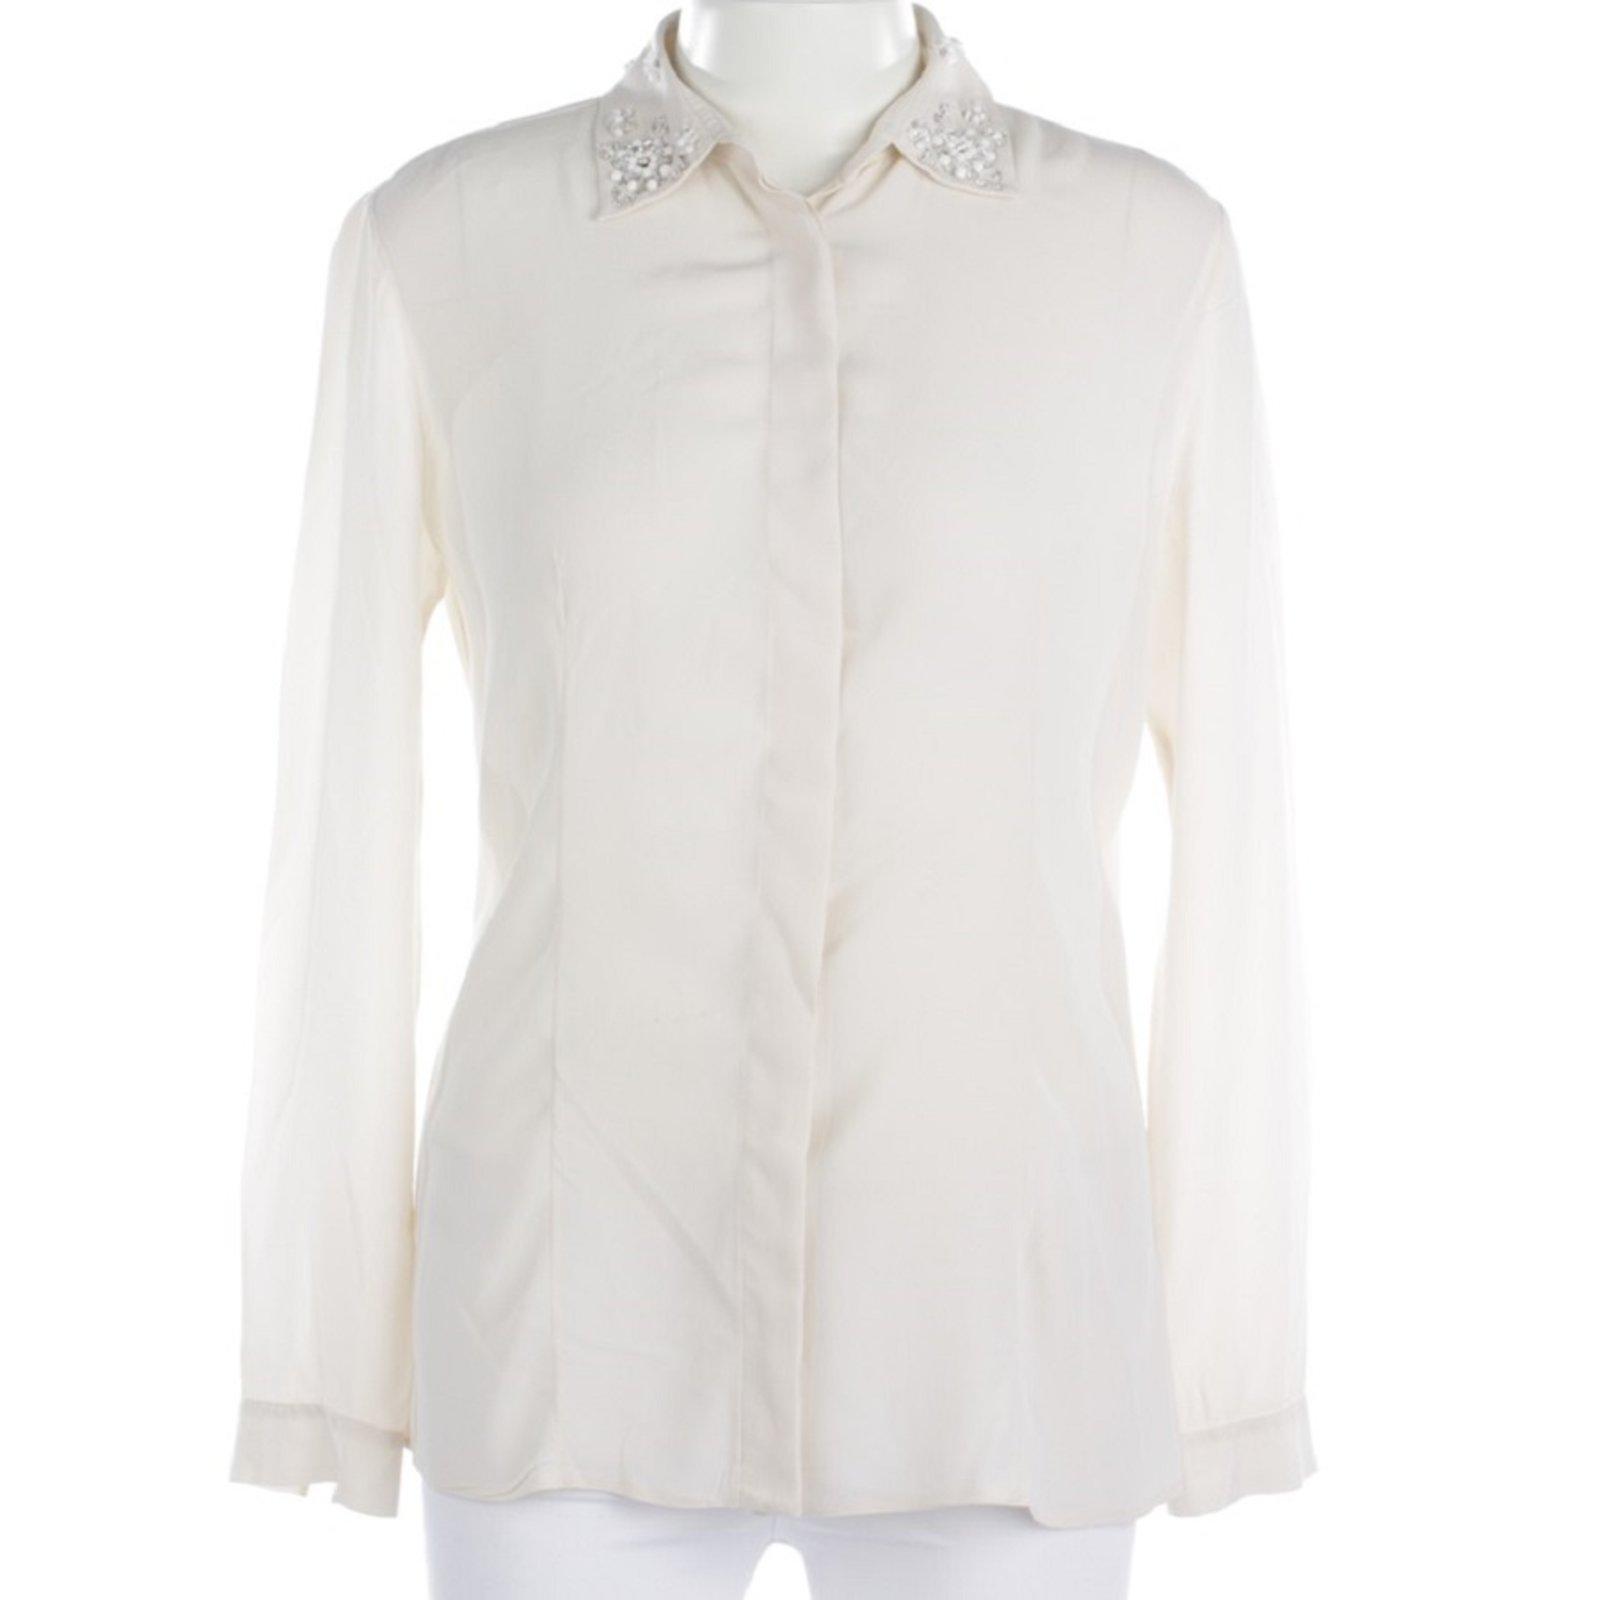 c8e4df96d50c53 Prada Tops Tops Silk Cream ref.90631 - Joli Closet